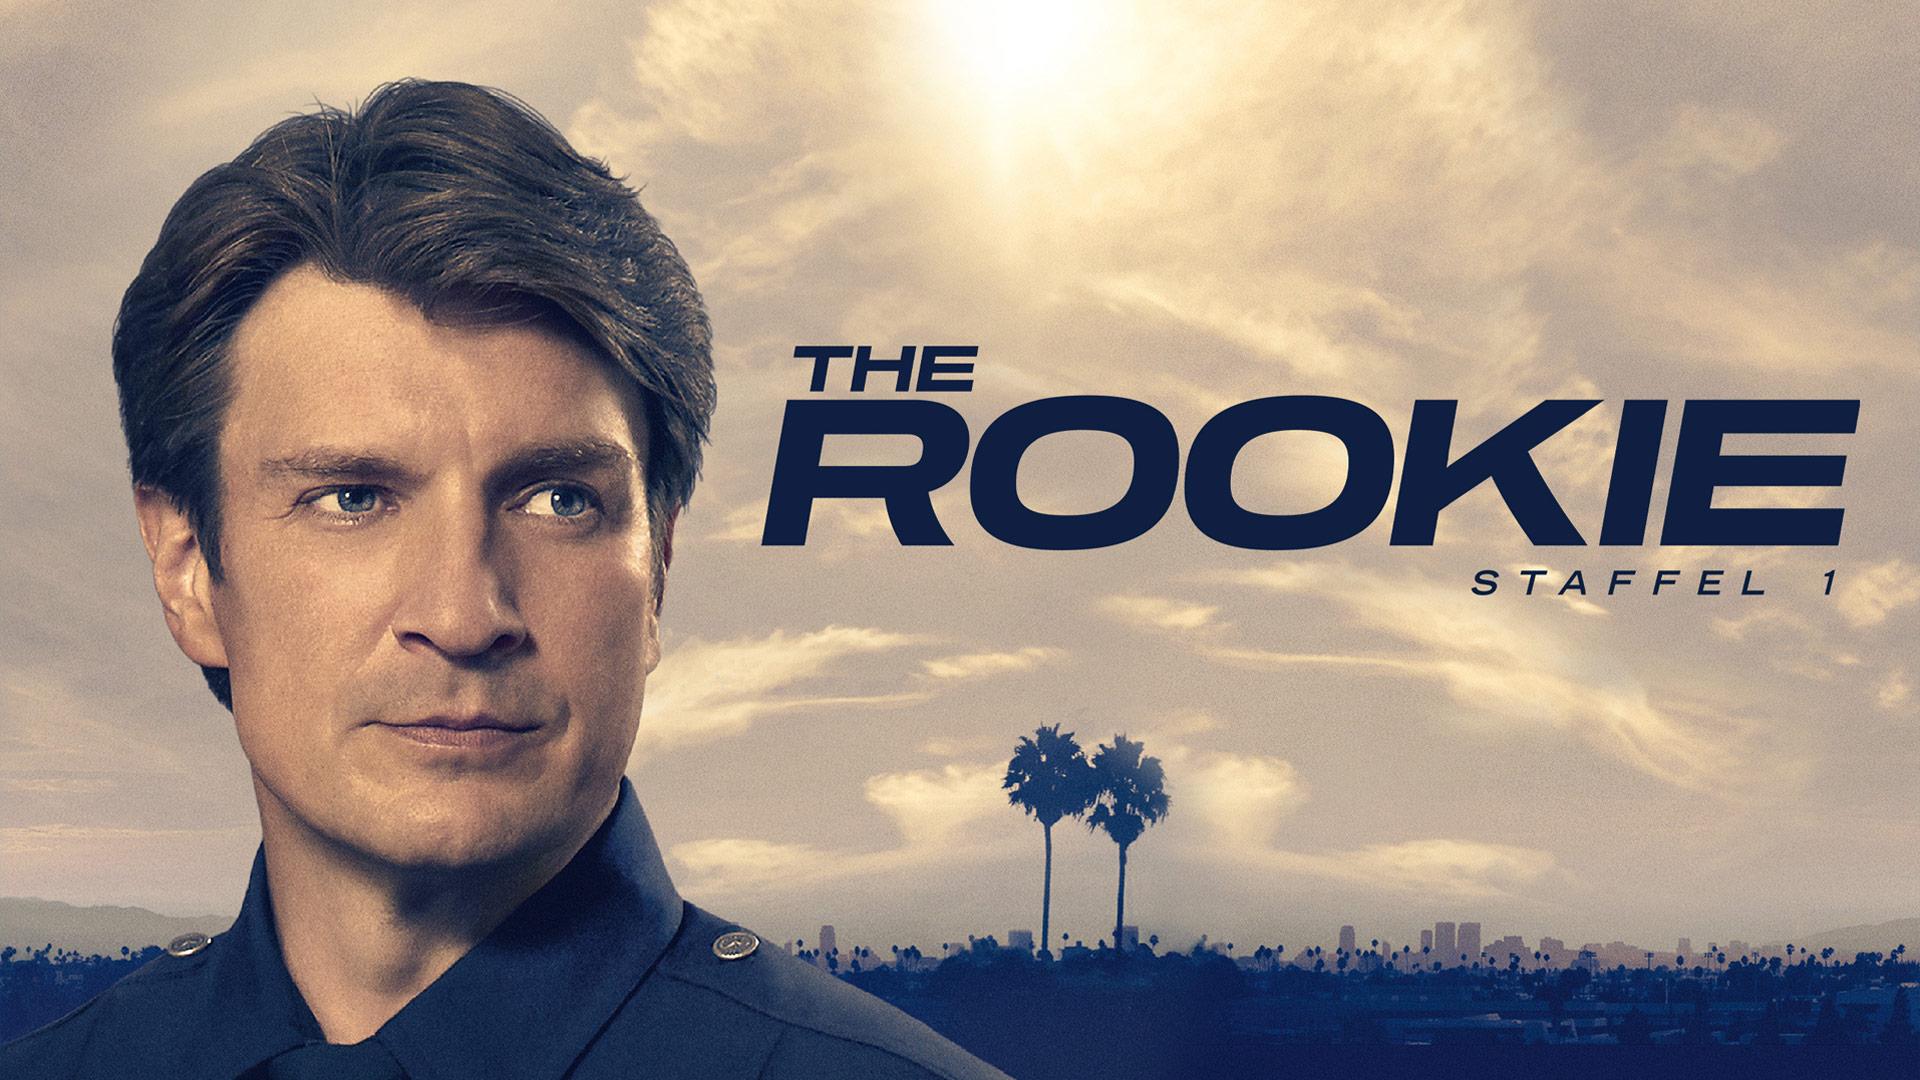 The Rookie - Staffel 1 [dt./OV]